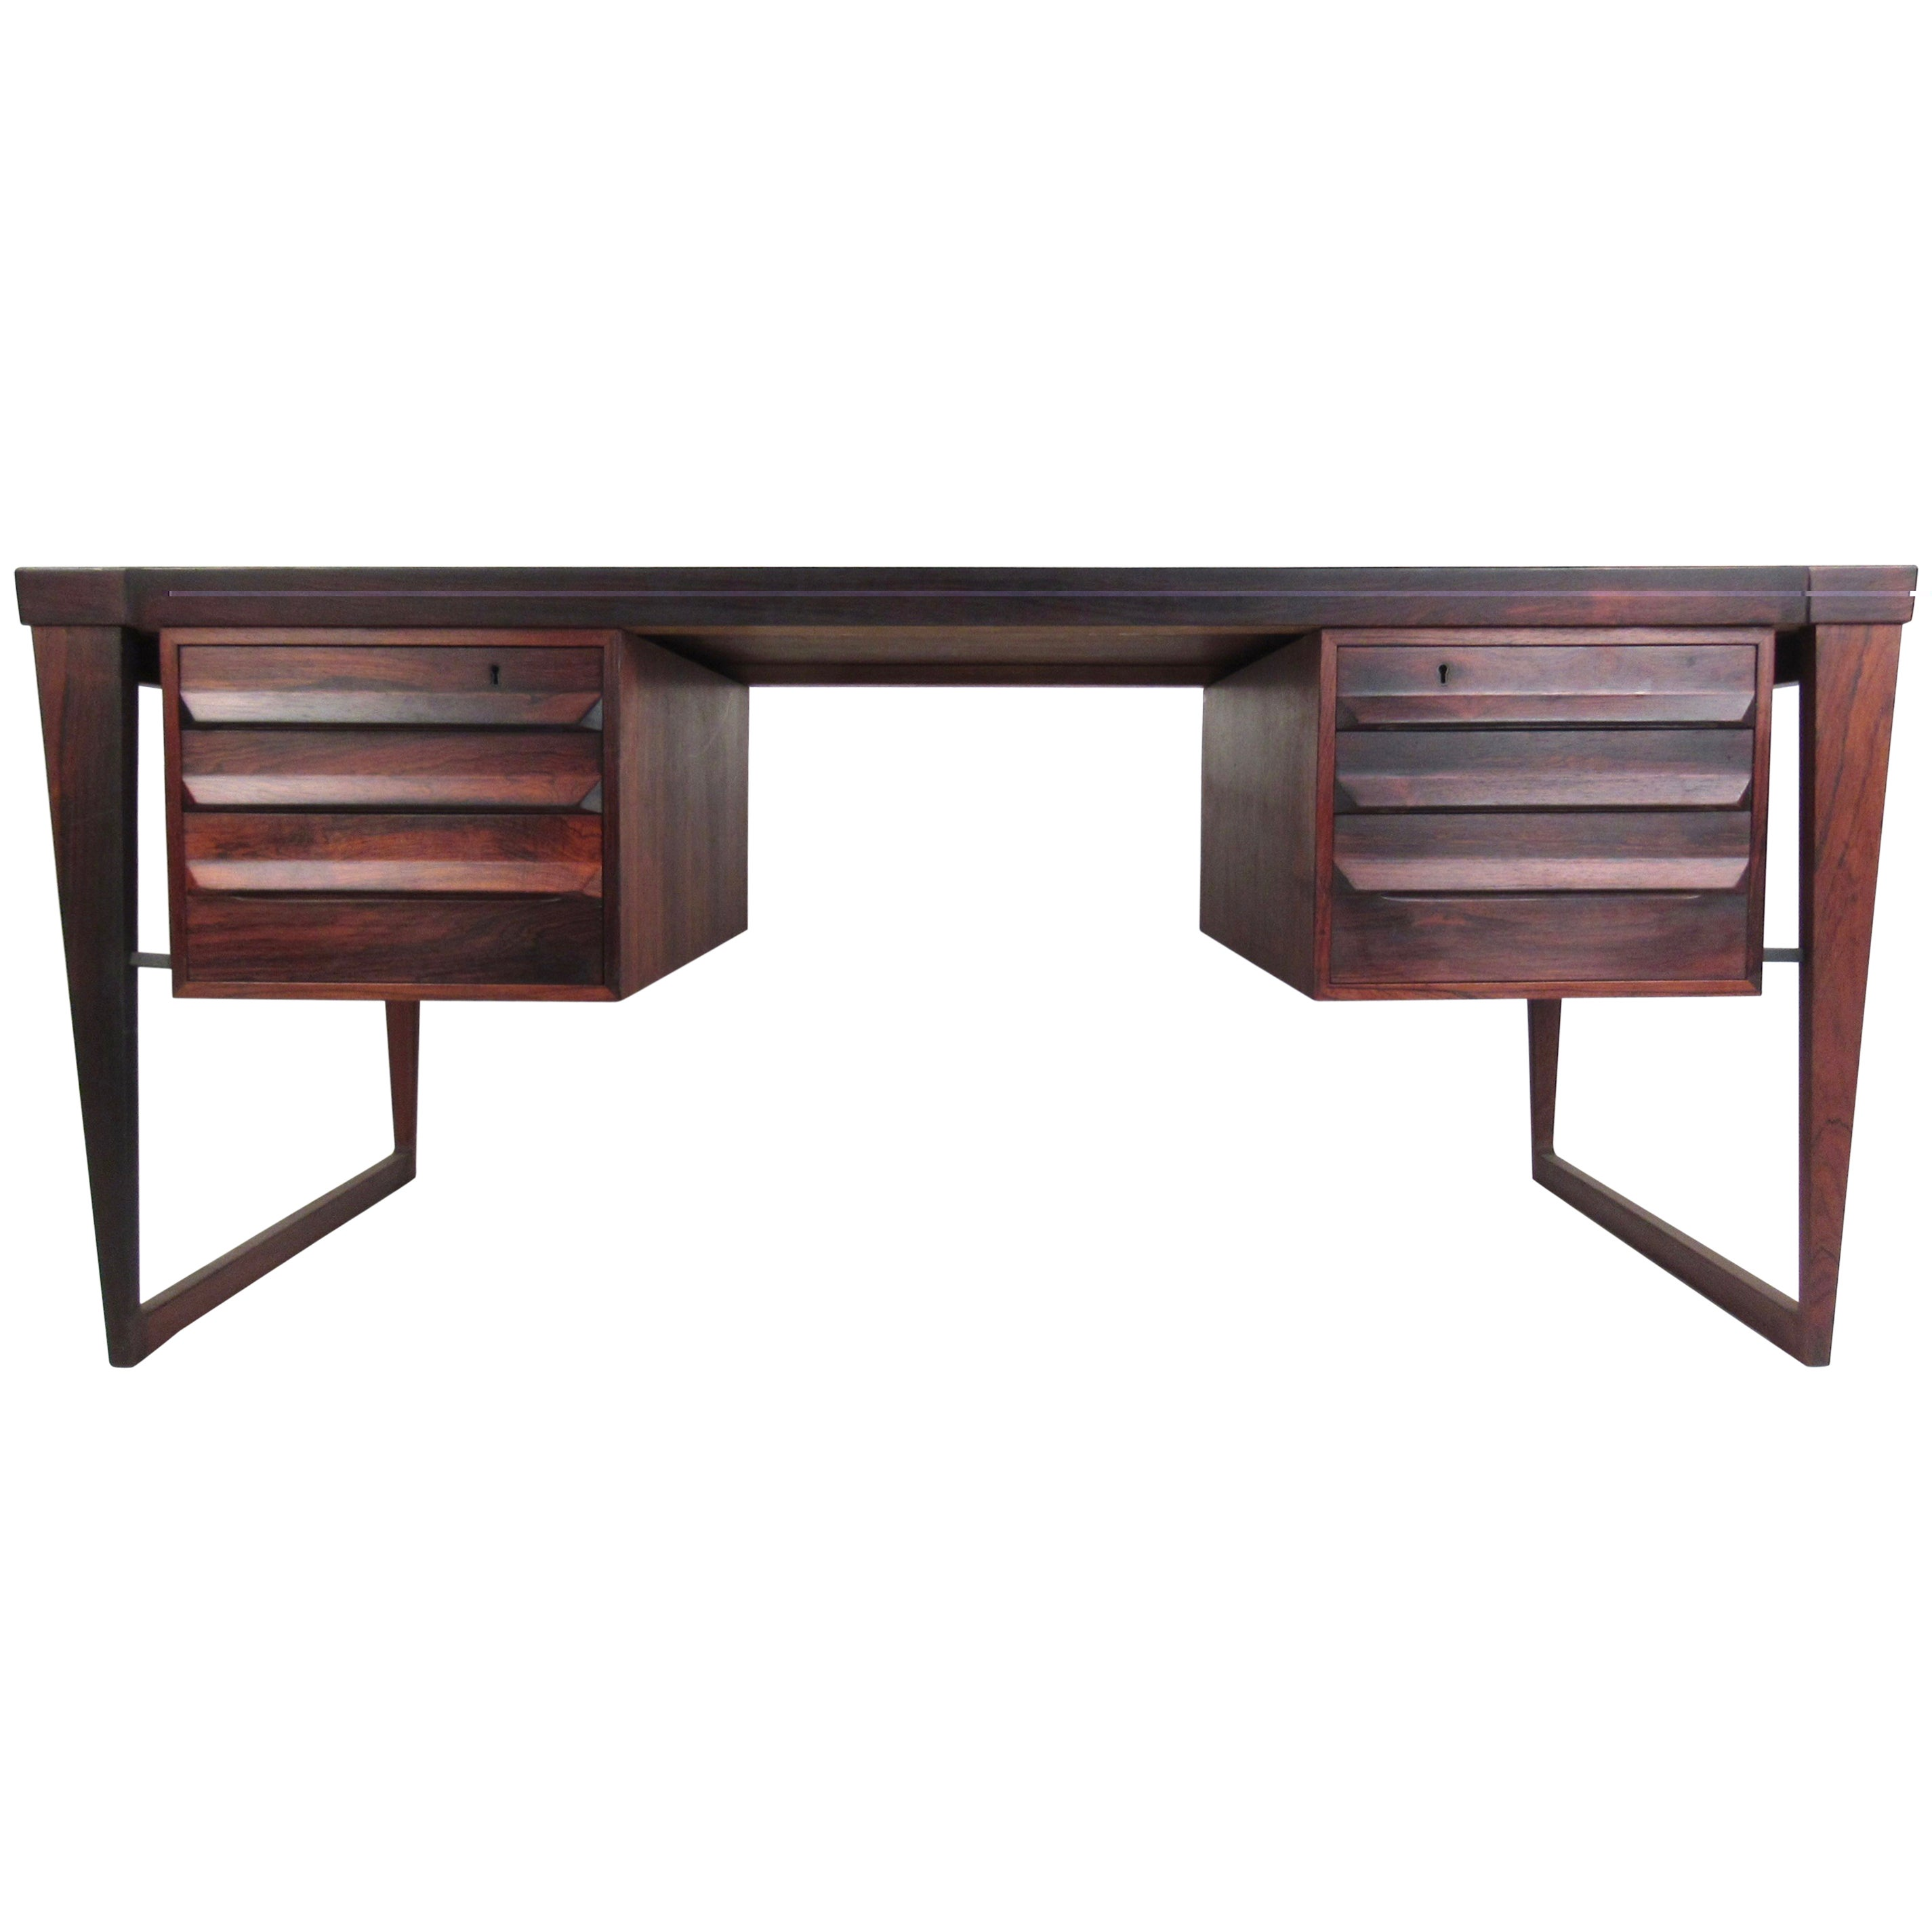 Mid-Century Modern Rosewood Executive Desk by Kai Kristiansen